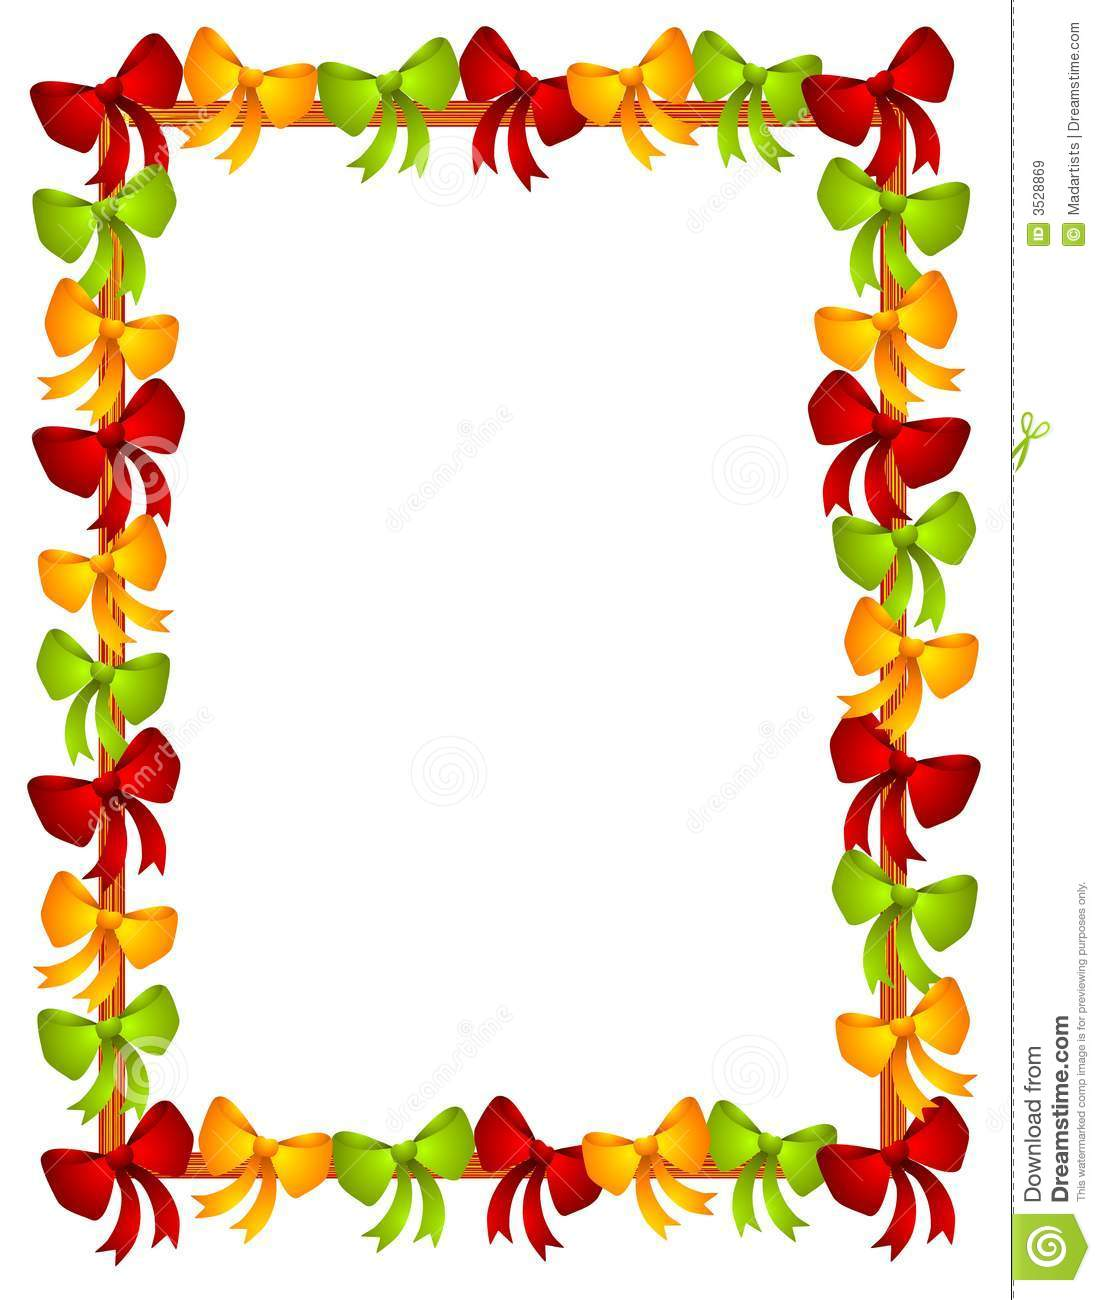 Border Frames Clip Art Free Download.